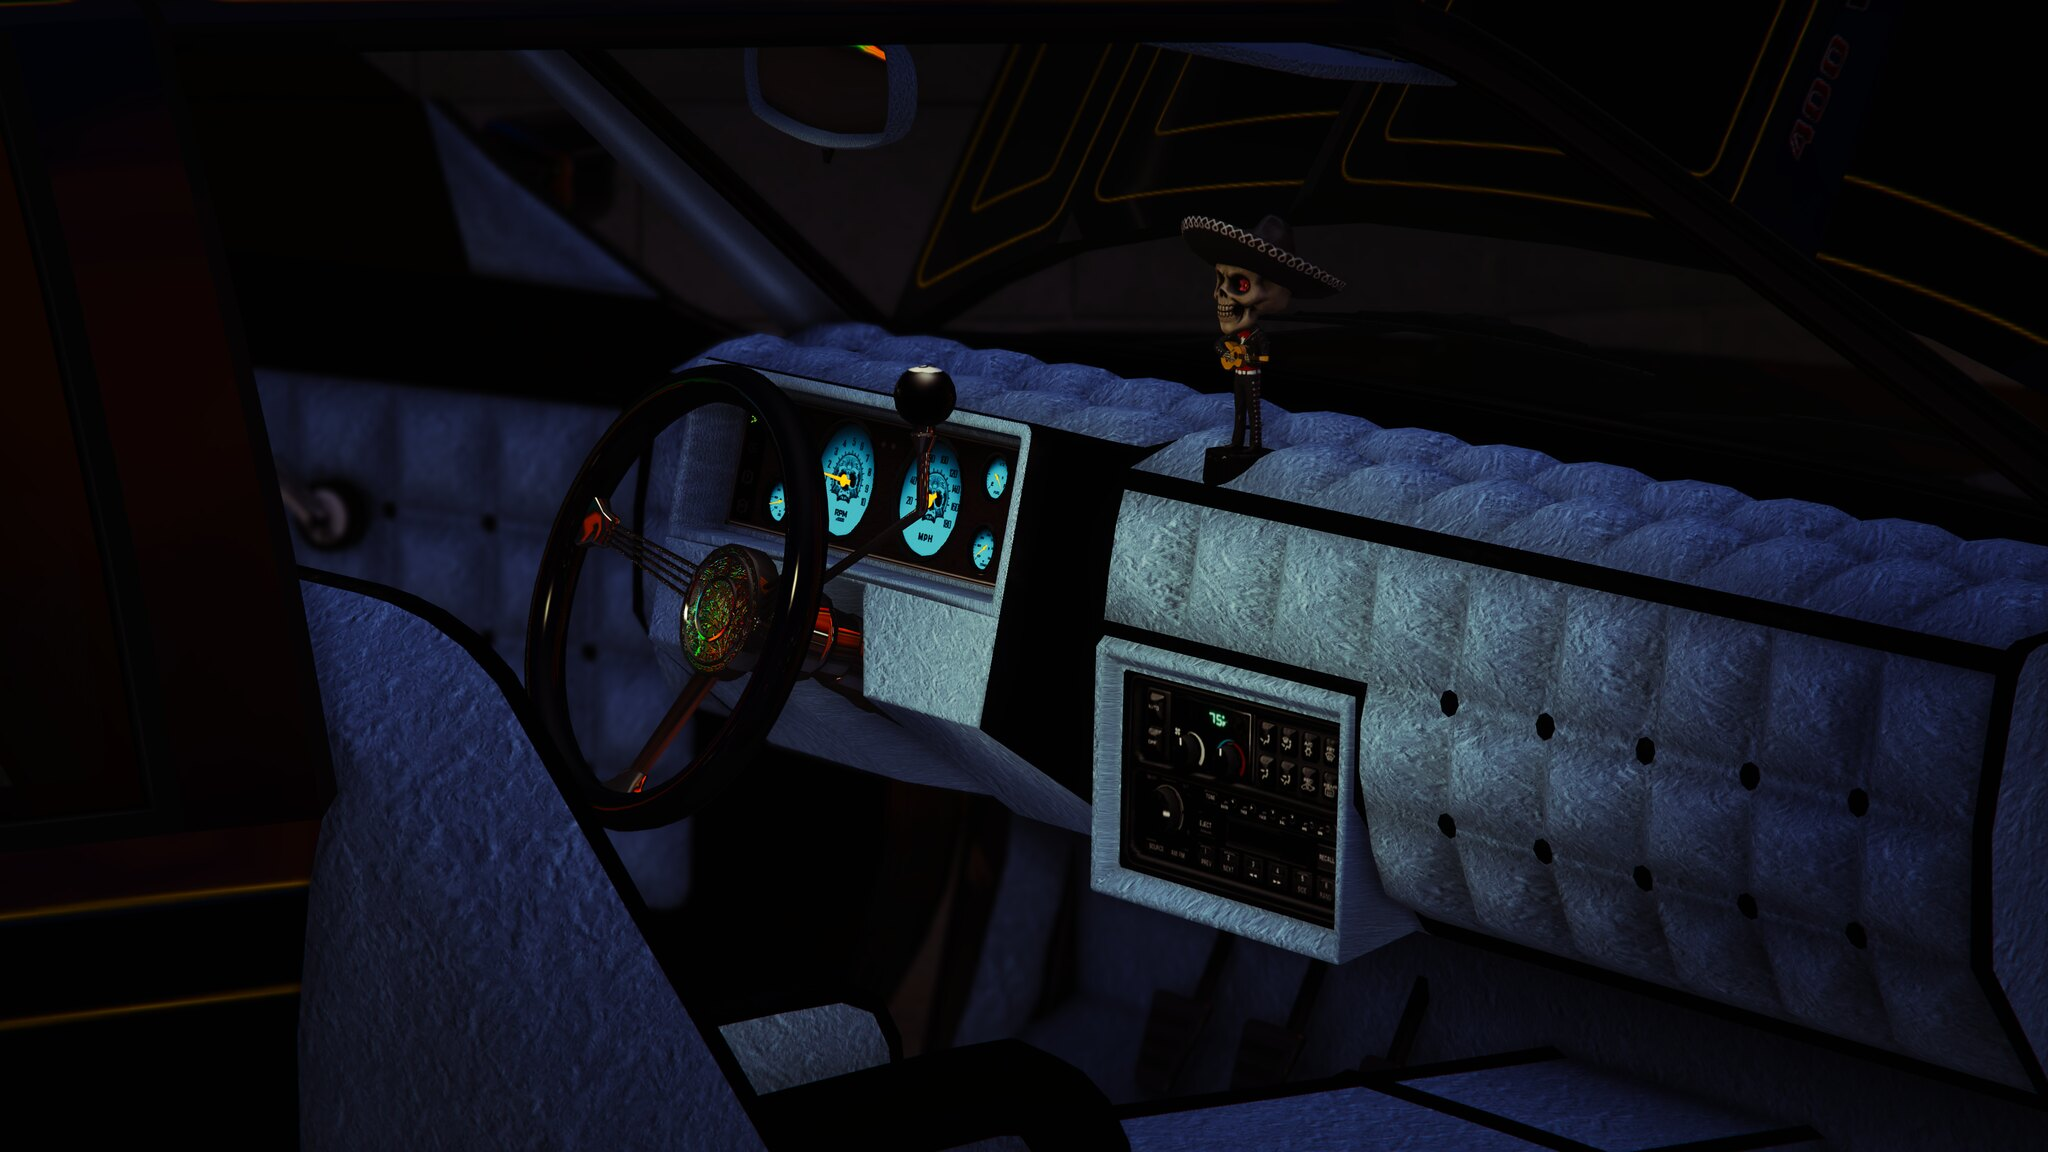 GTA V Screenshots (Official)   - Page 3 21818141054_3b9857b027_k